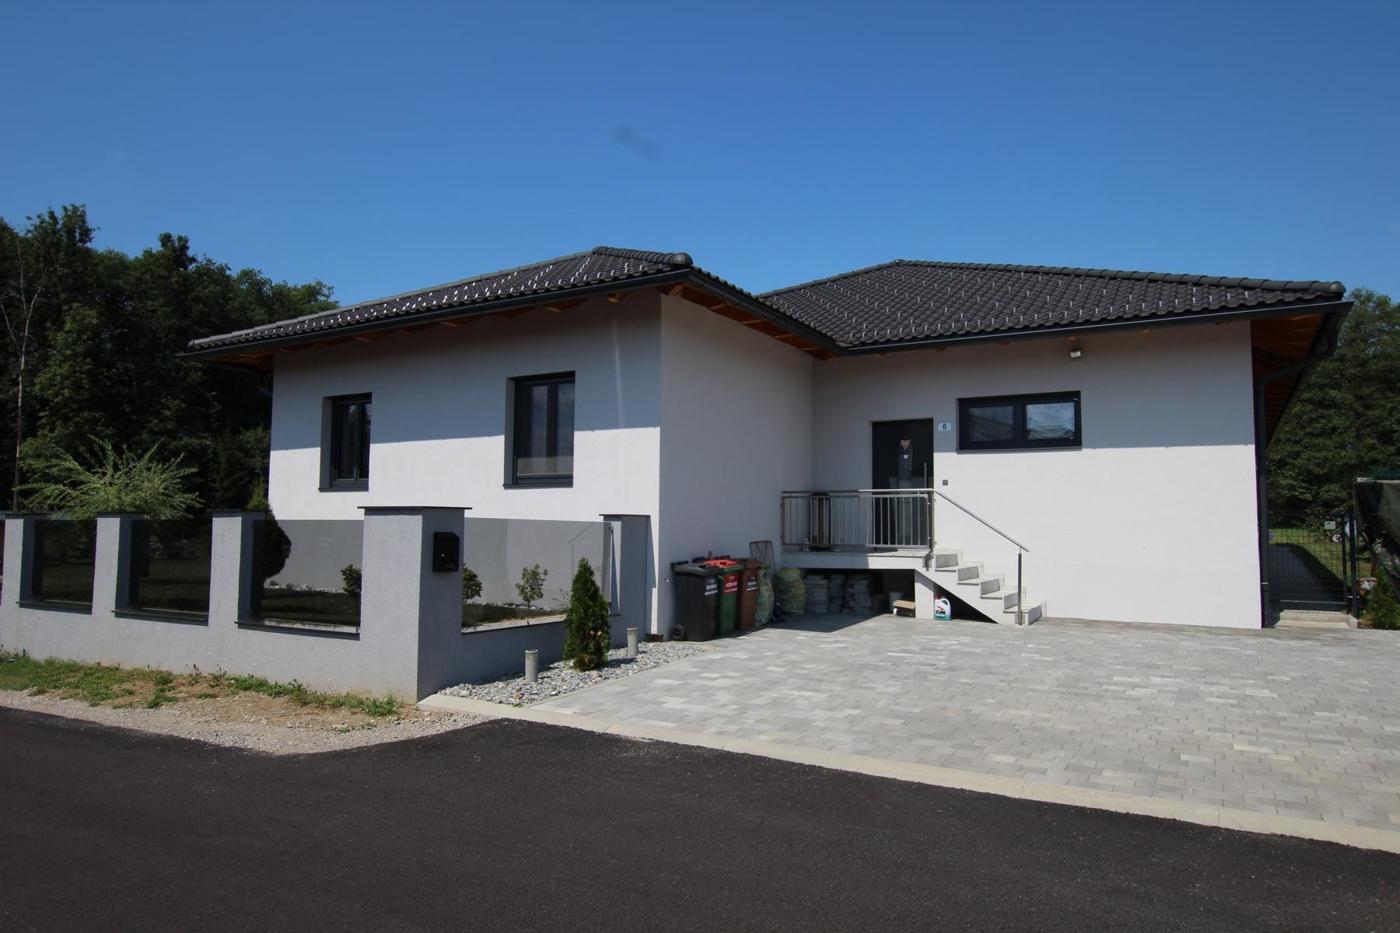 Haus, Universumgasse 6, 9064, Magdalensberg